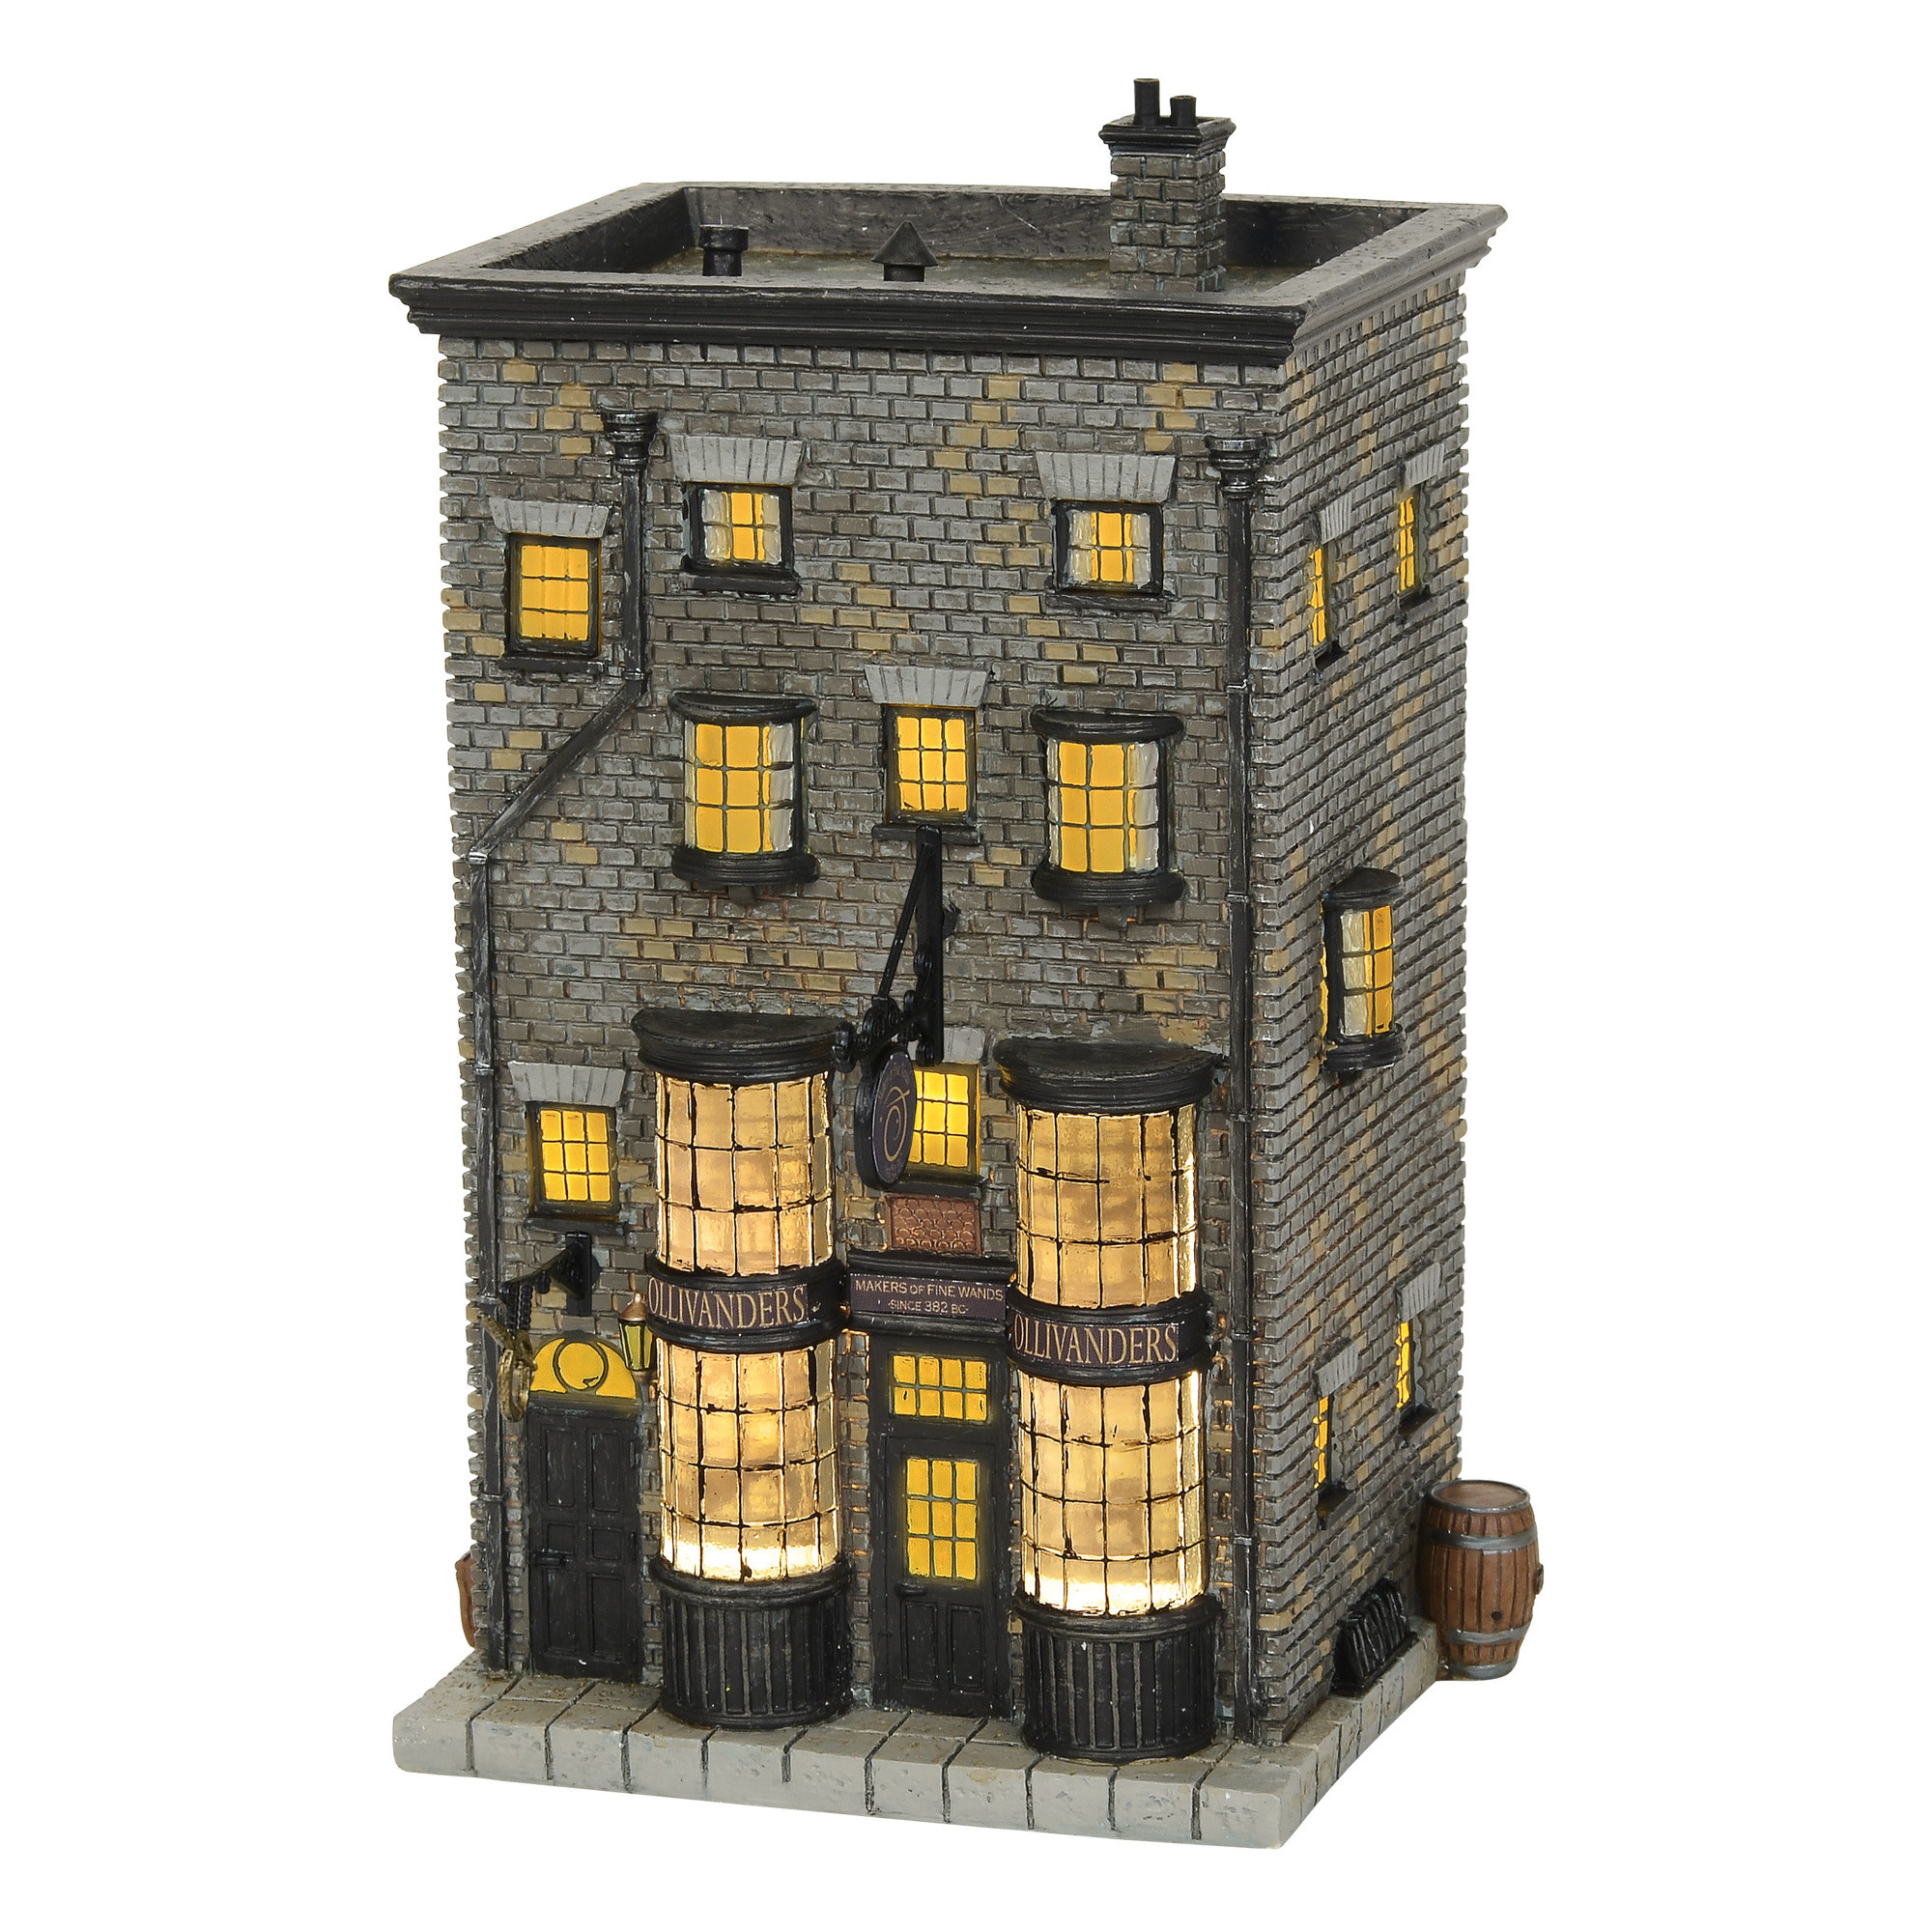 Department 56 Department 56 Harry Potter Village Ollivander's Wand Shop